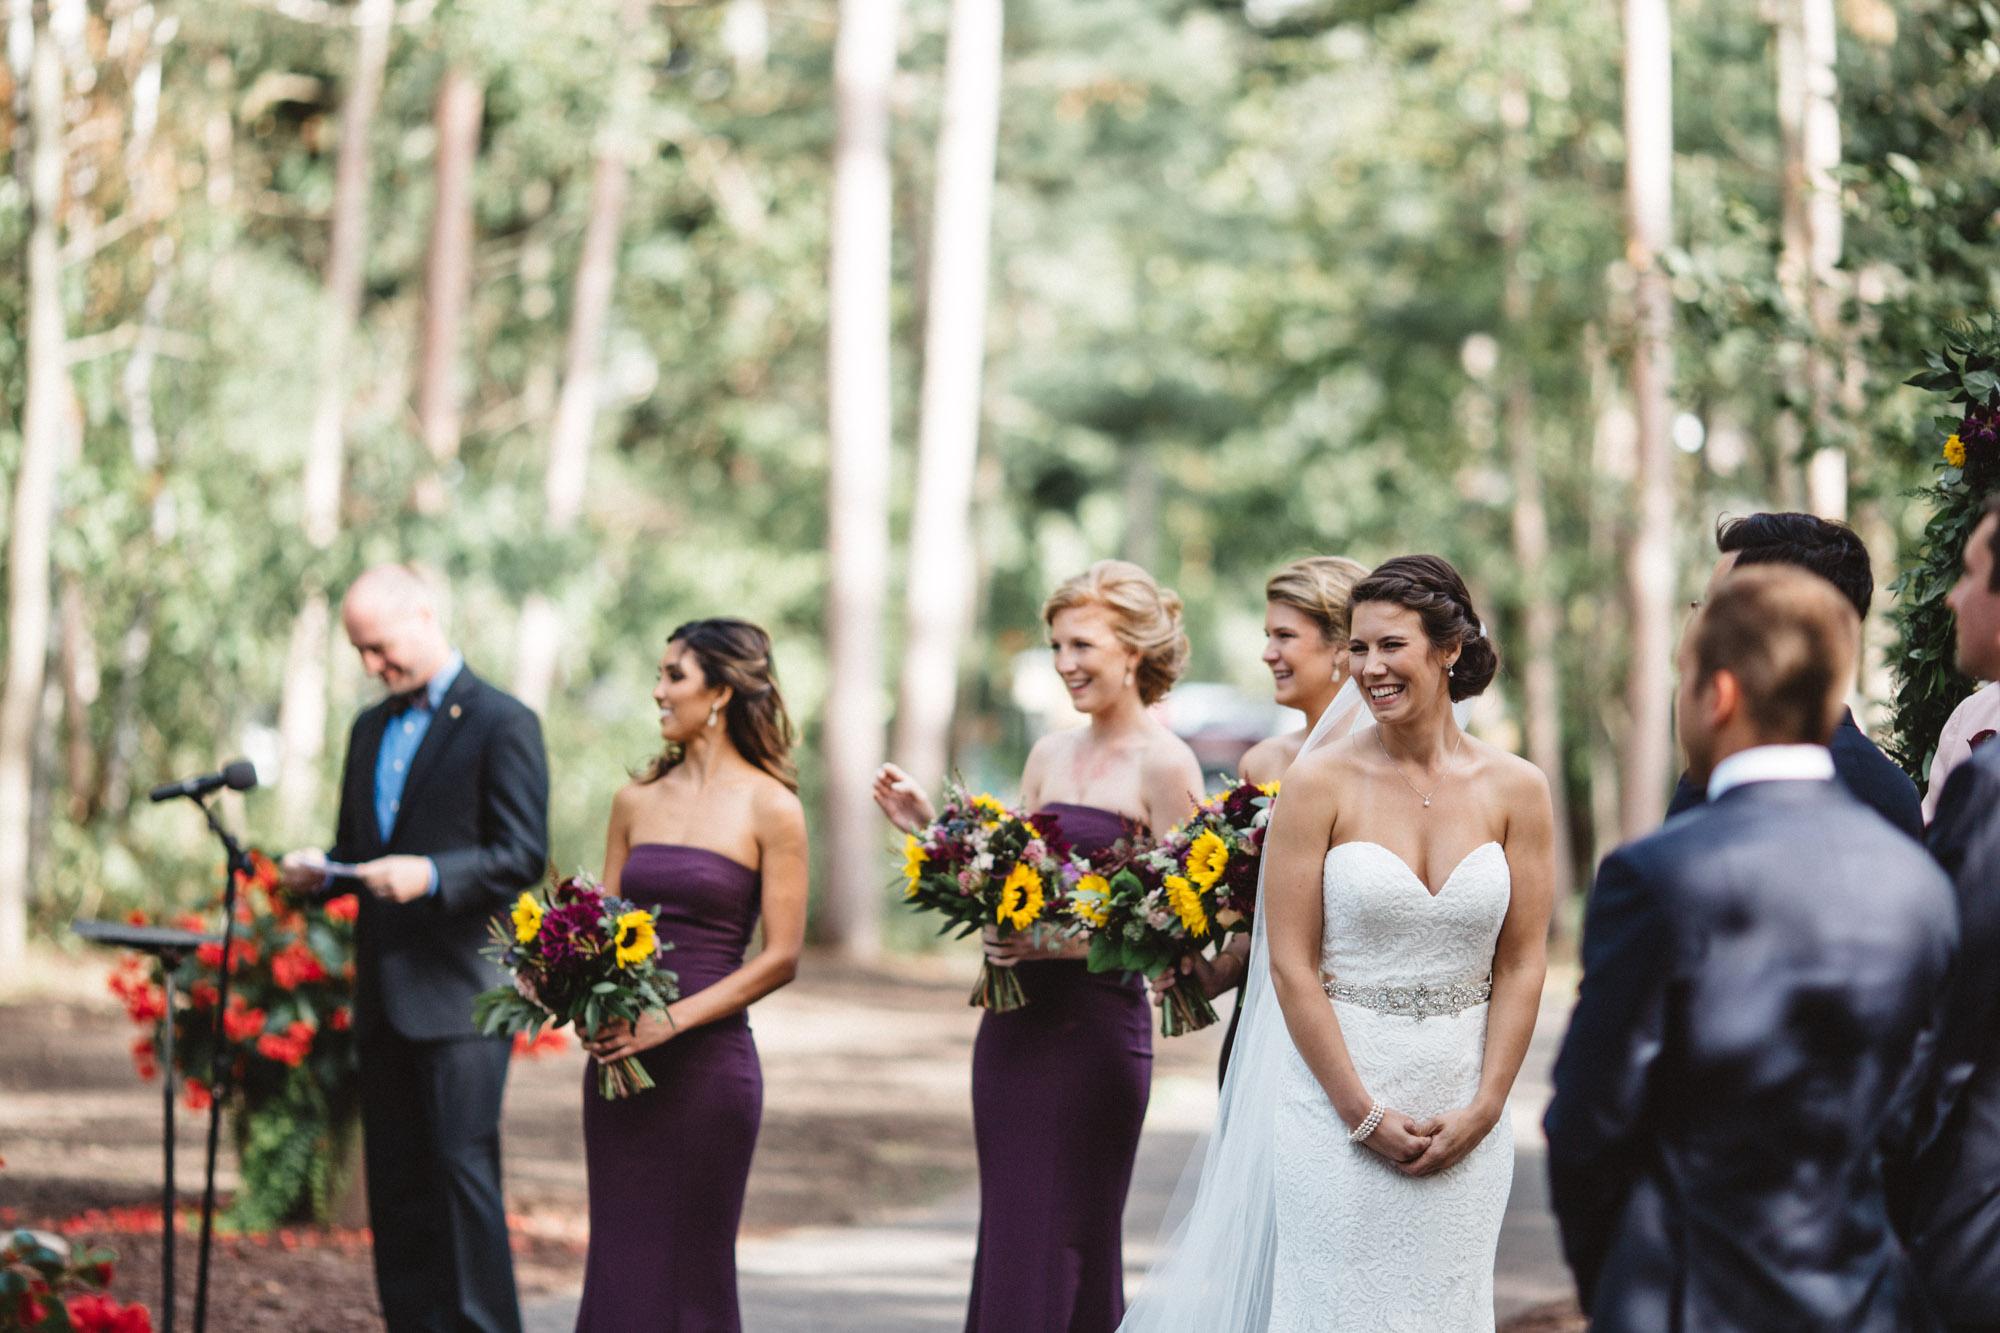 Candid wedding photography by Britt DeZeeuw, Grand View Lodge photographer.